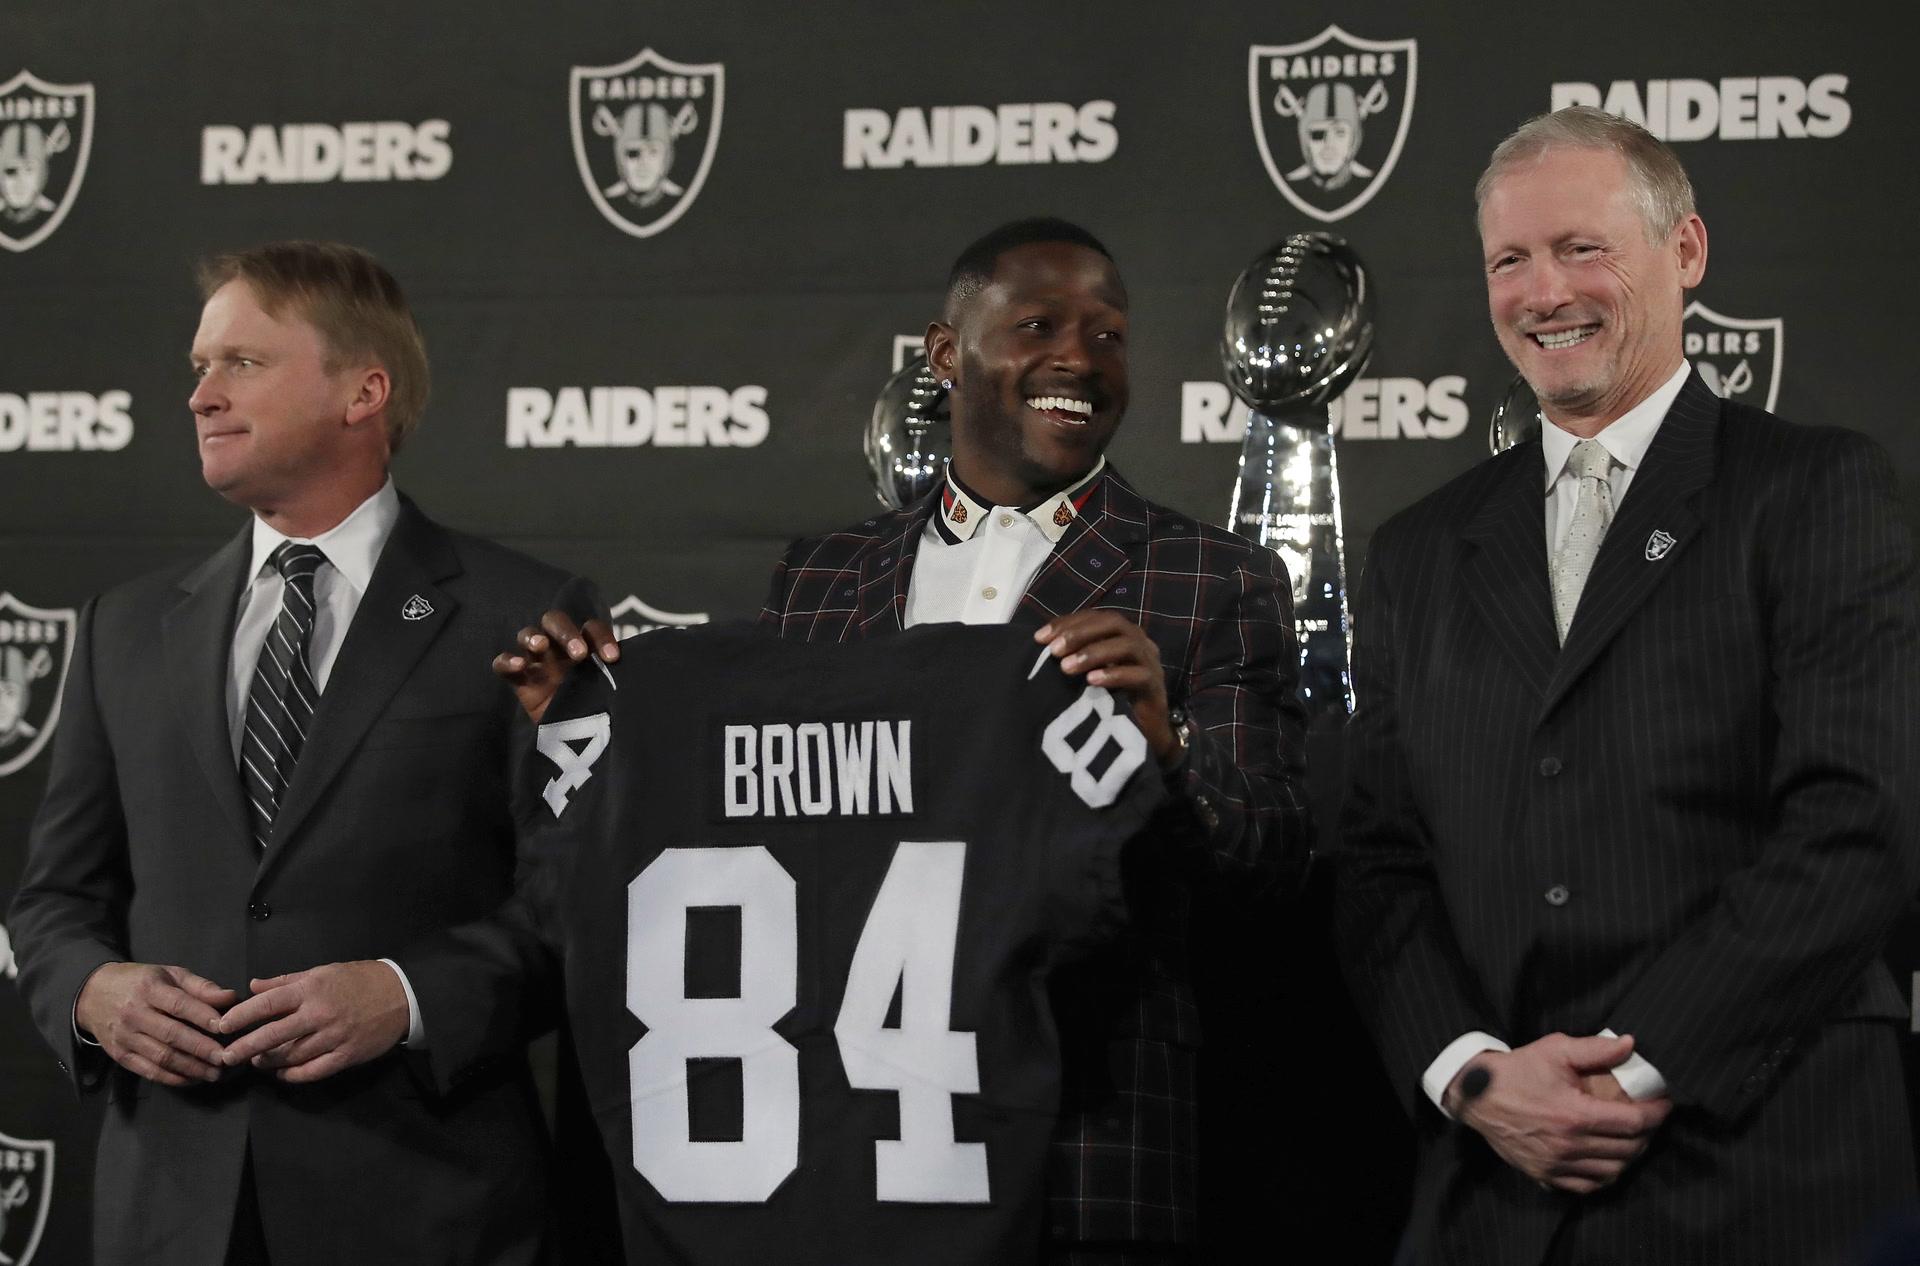 Raiders Deal For Wr Antonio Brown Developed In Las Vegas Video Las Vegas Review Journal